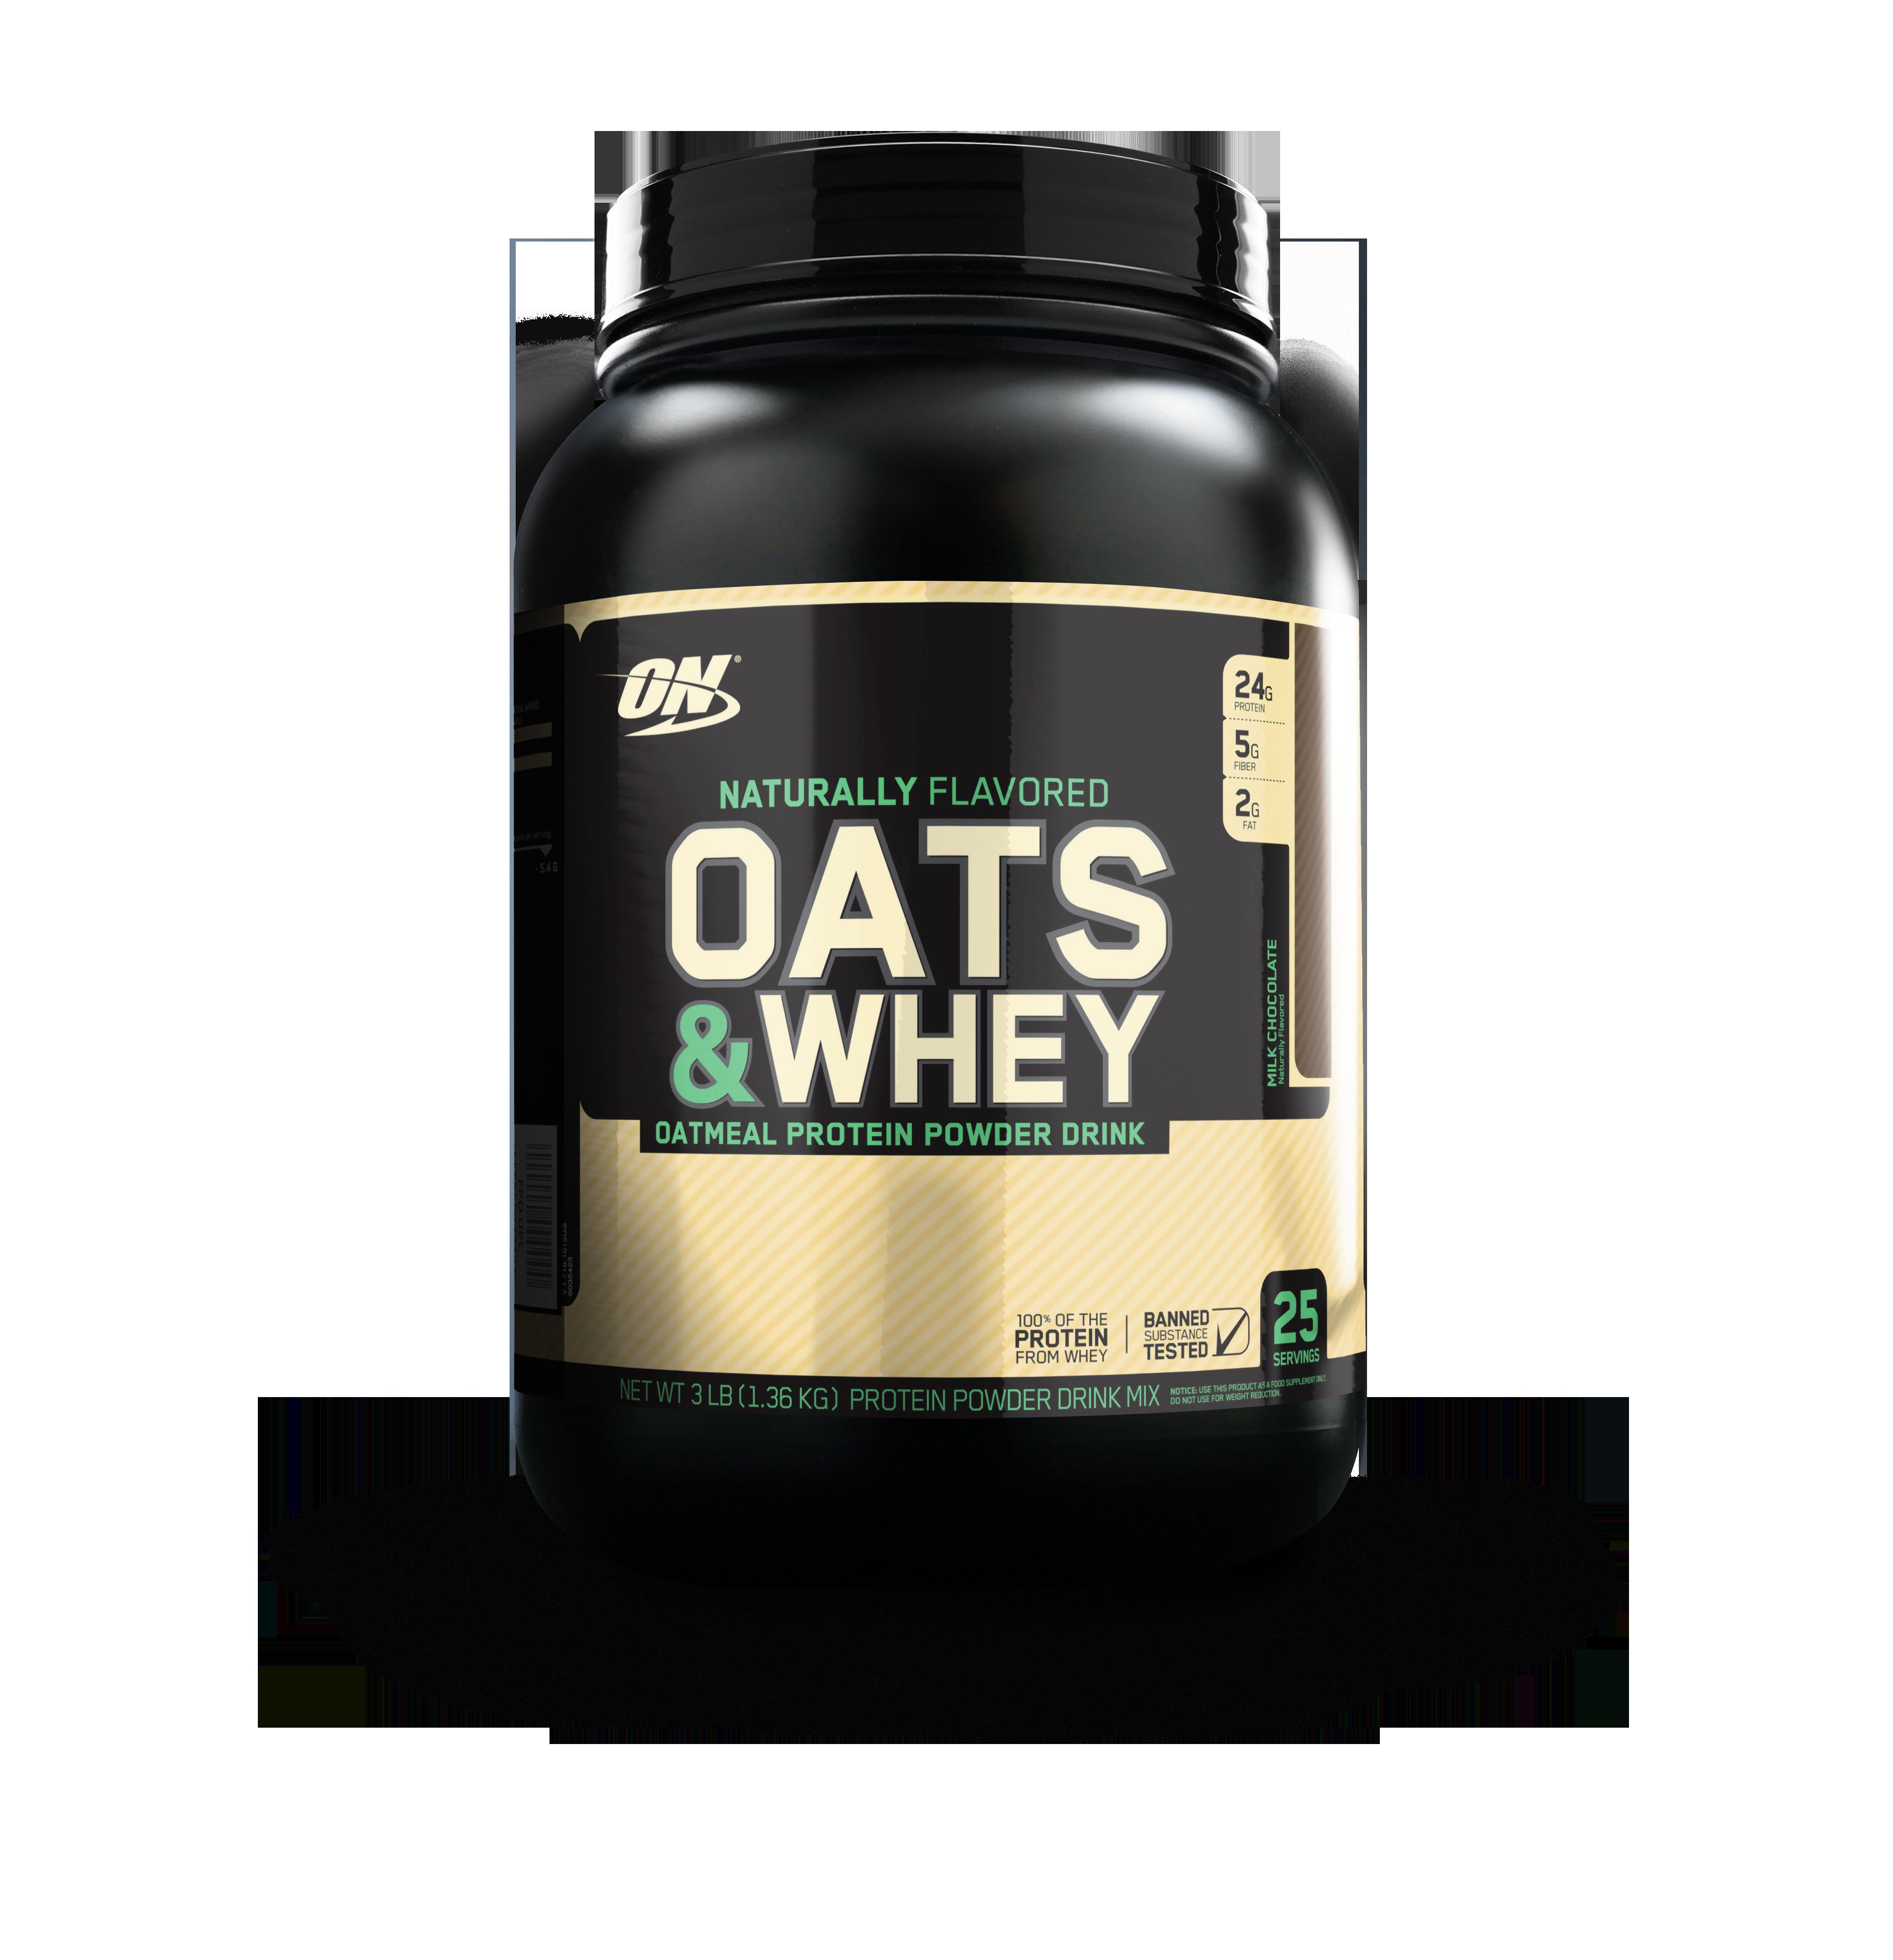 Optimum Nutrition Natural Oats & Whey 1.36Kg